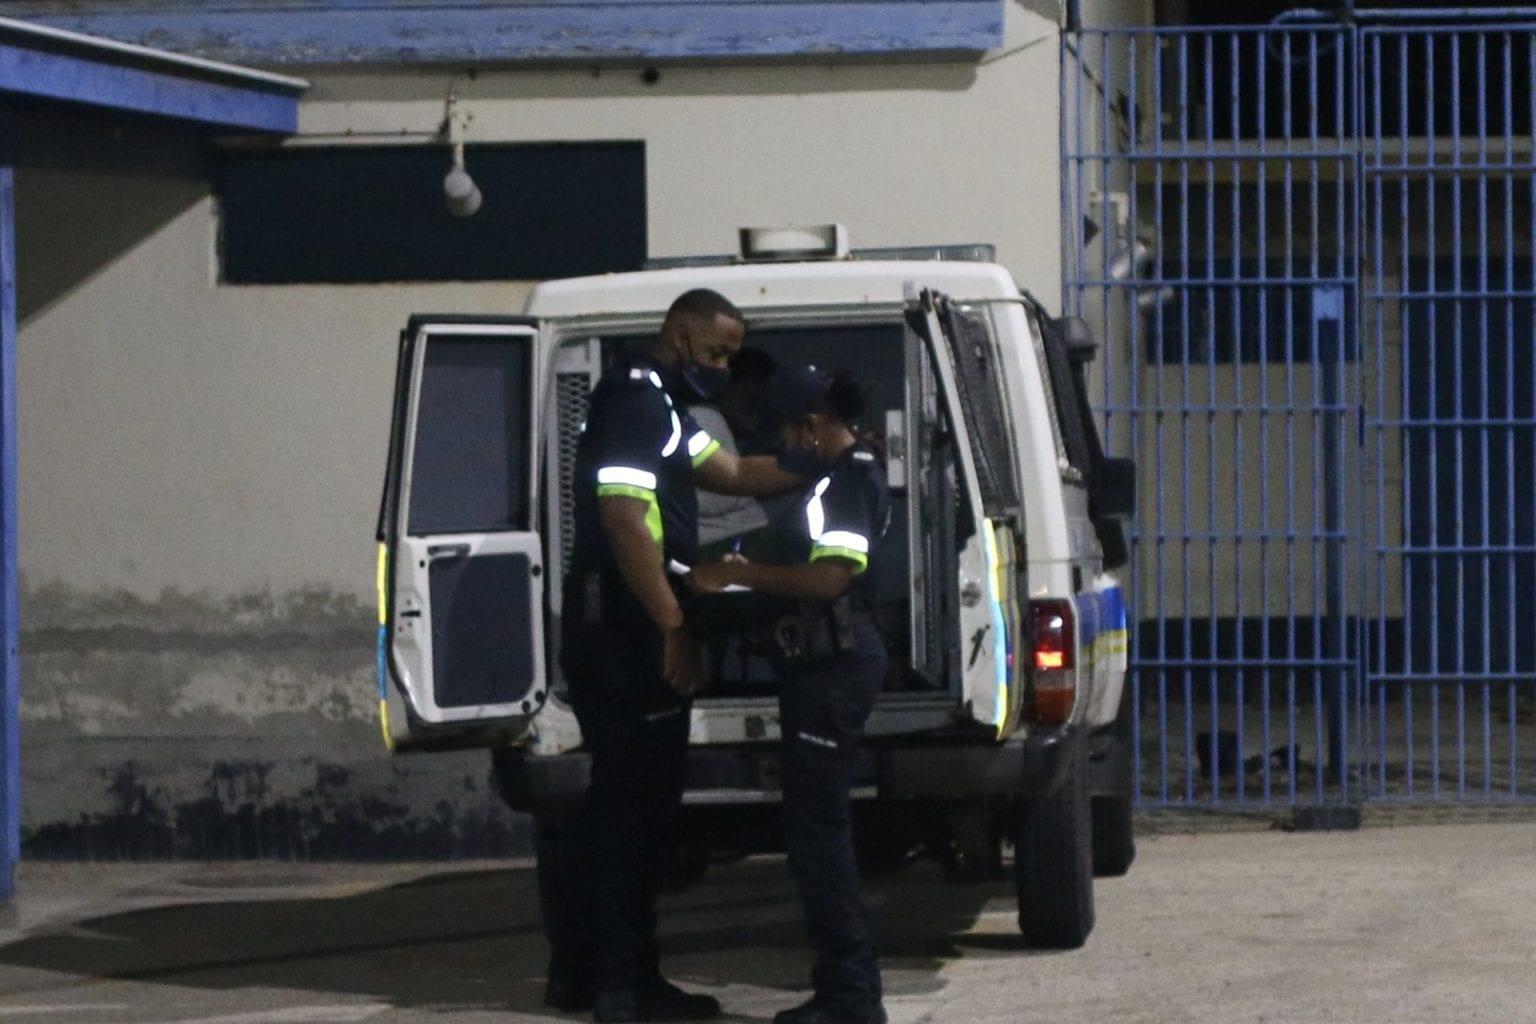 Pelea a termina den detencion y bishita na ImSan